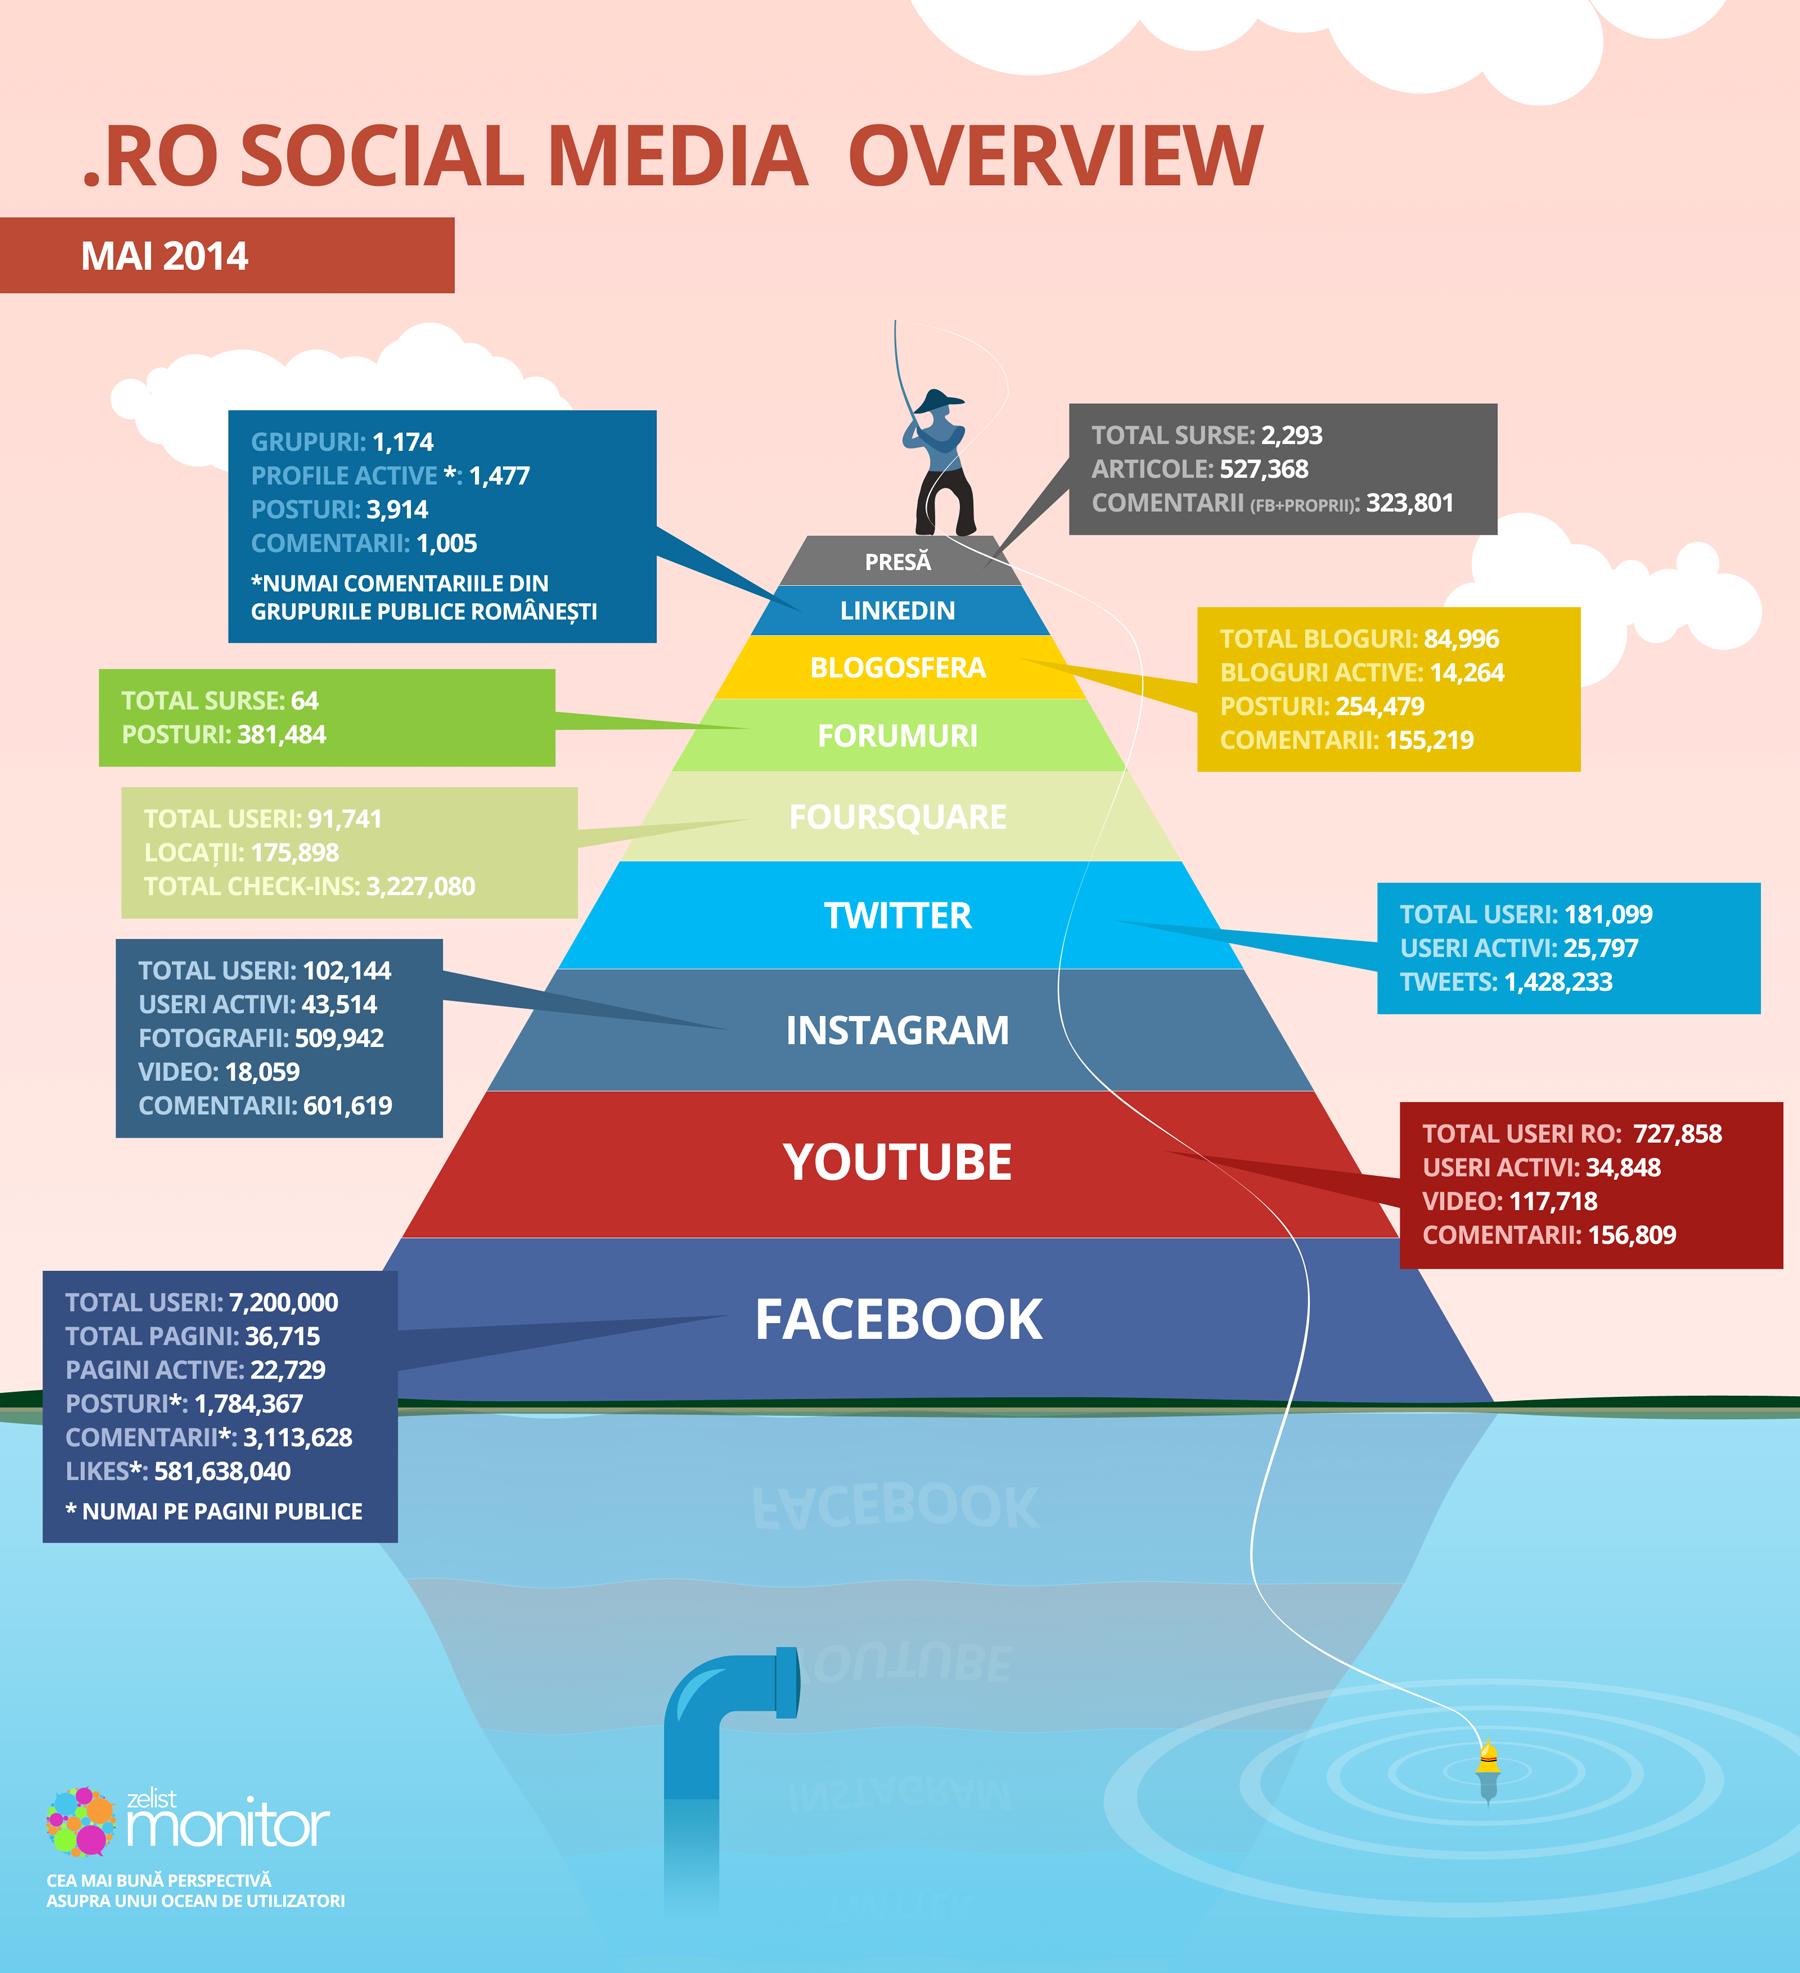 Overview social media mai 2014